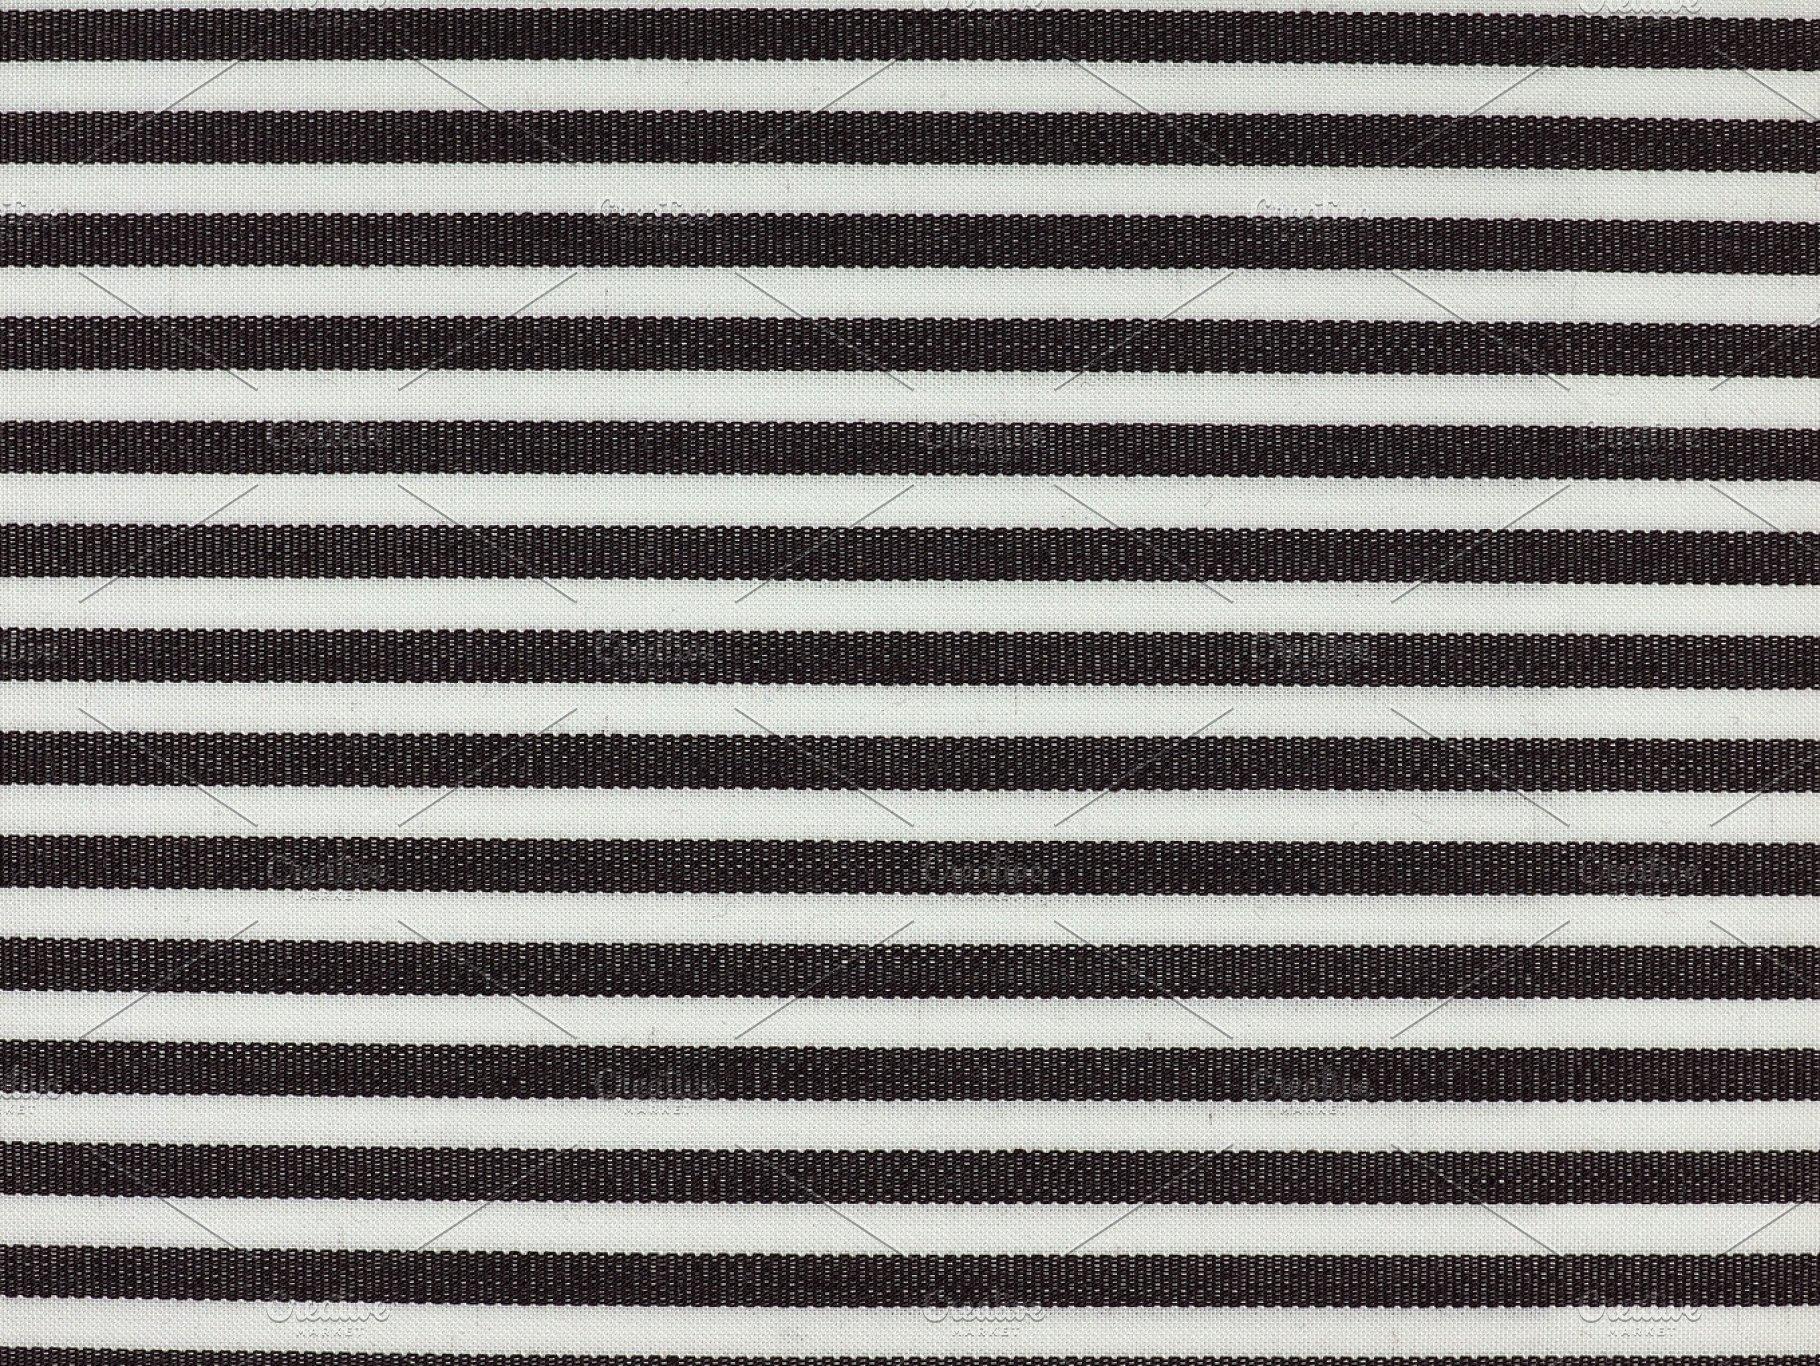 Black Striped Fabric Texture Background Photos Creative Market